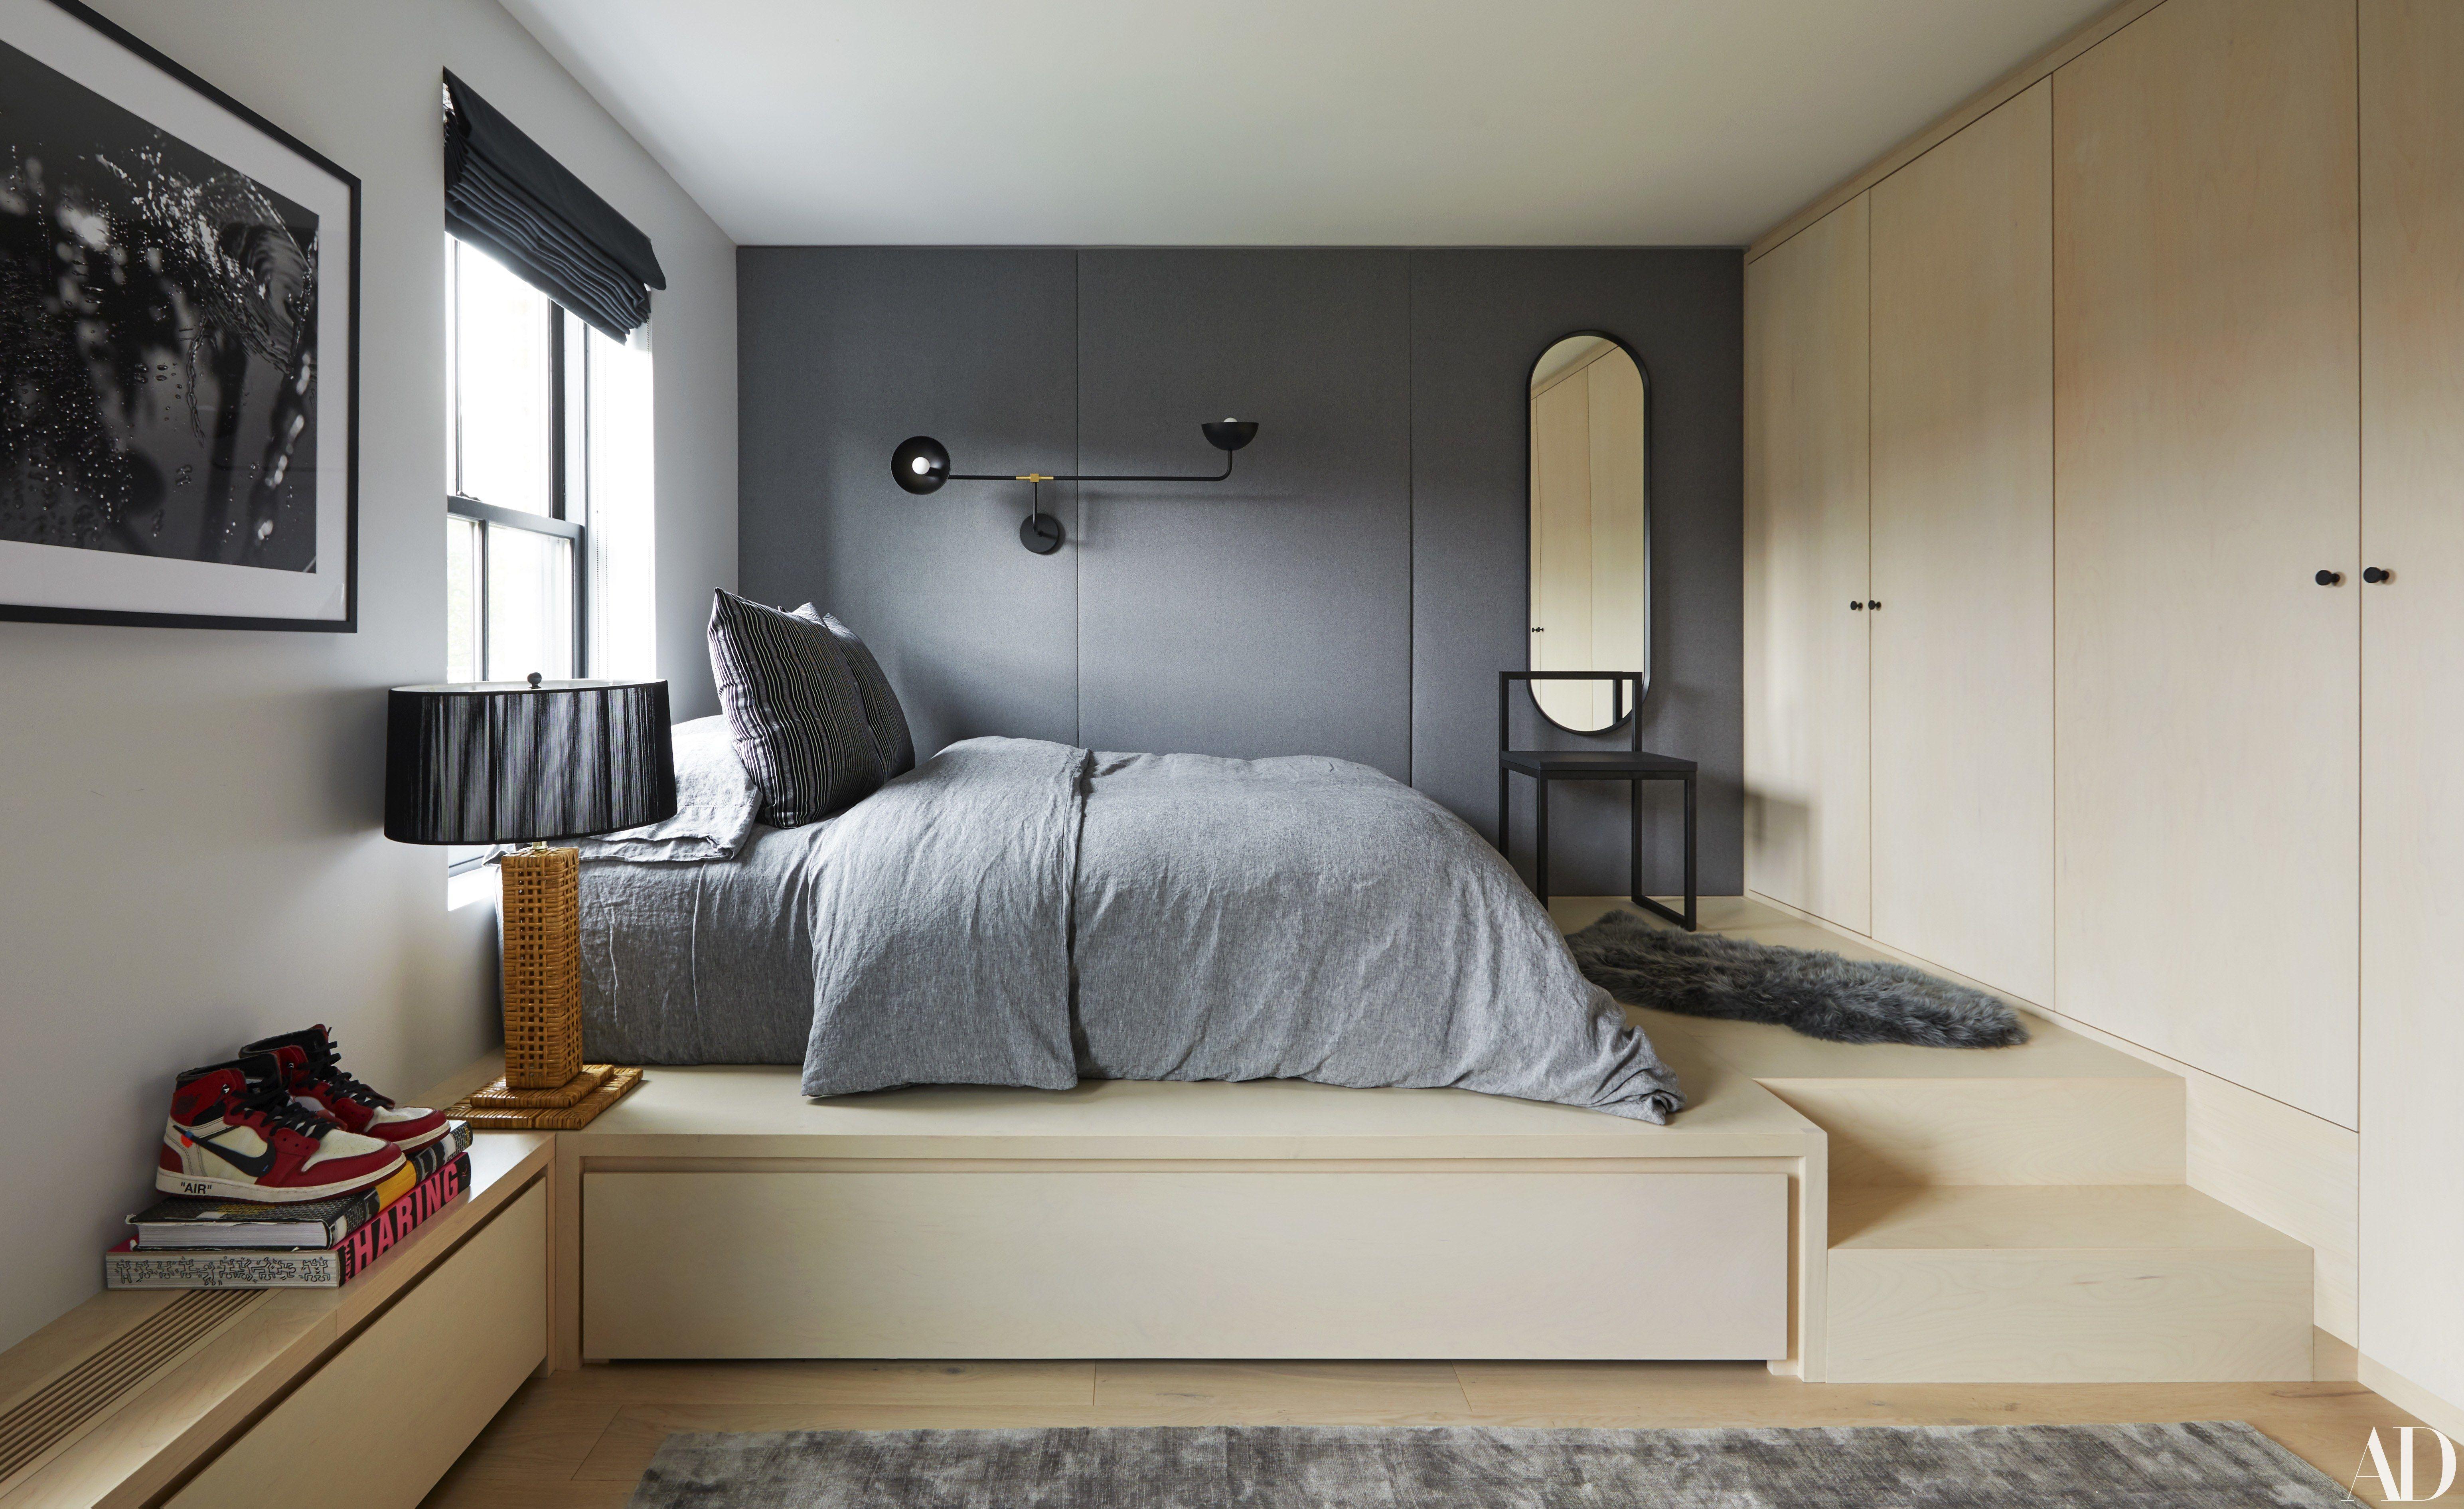 See Inside The Couple S Home Renovation Collaboration With Elizabeth Roberts Bedroom Design Black Bedroom Furniture Bedroom Decor